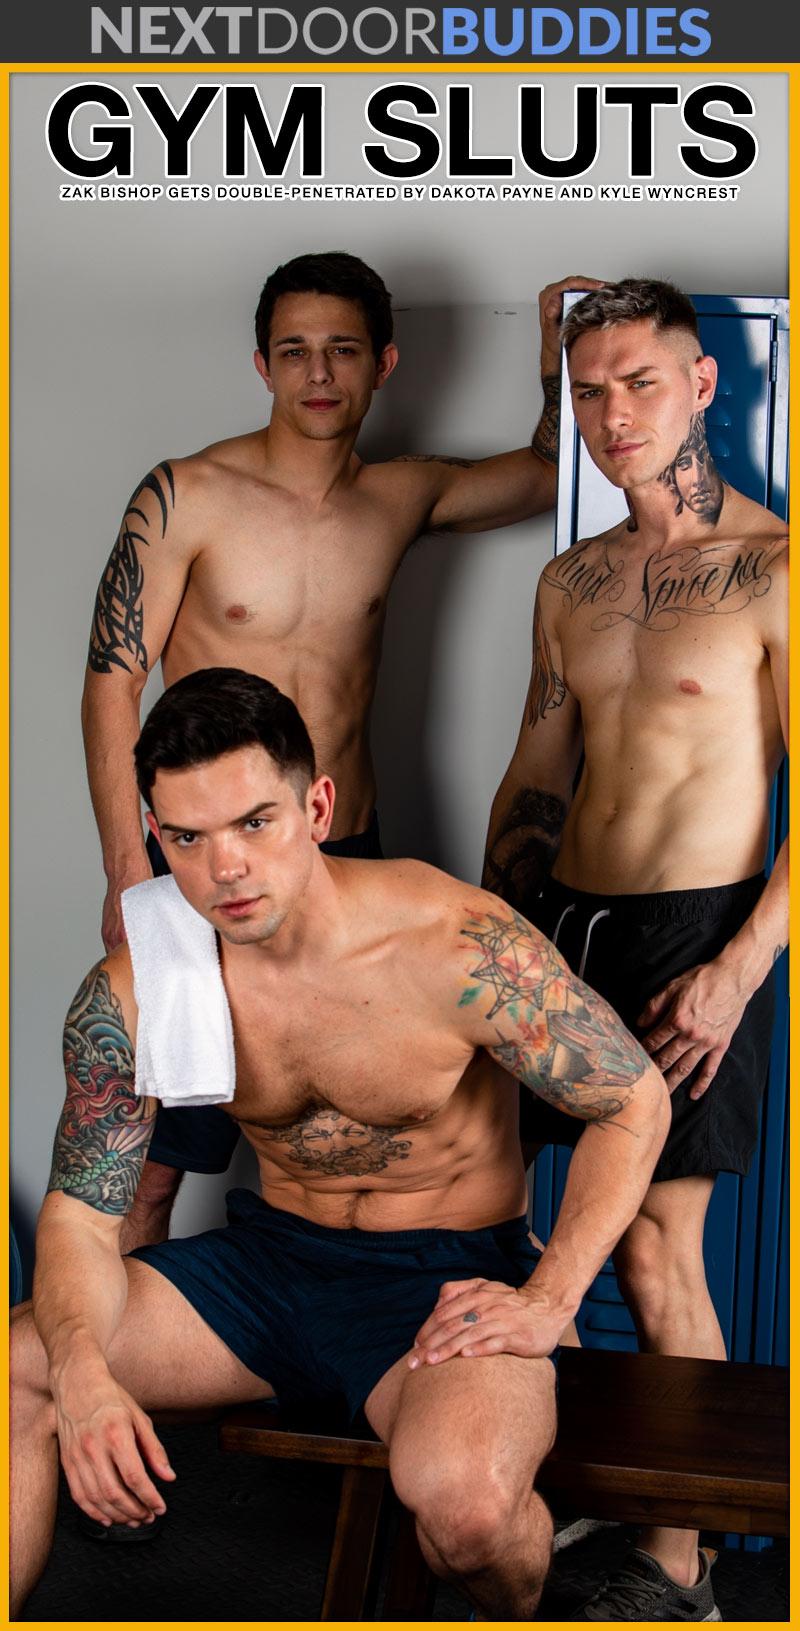 Gym Sluts - Zak Bishop, Dakota Payne and Kyle Wyncrest Cover